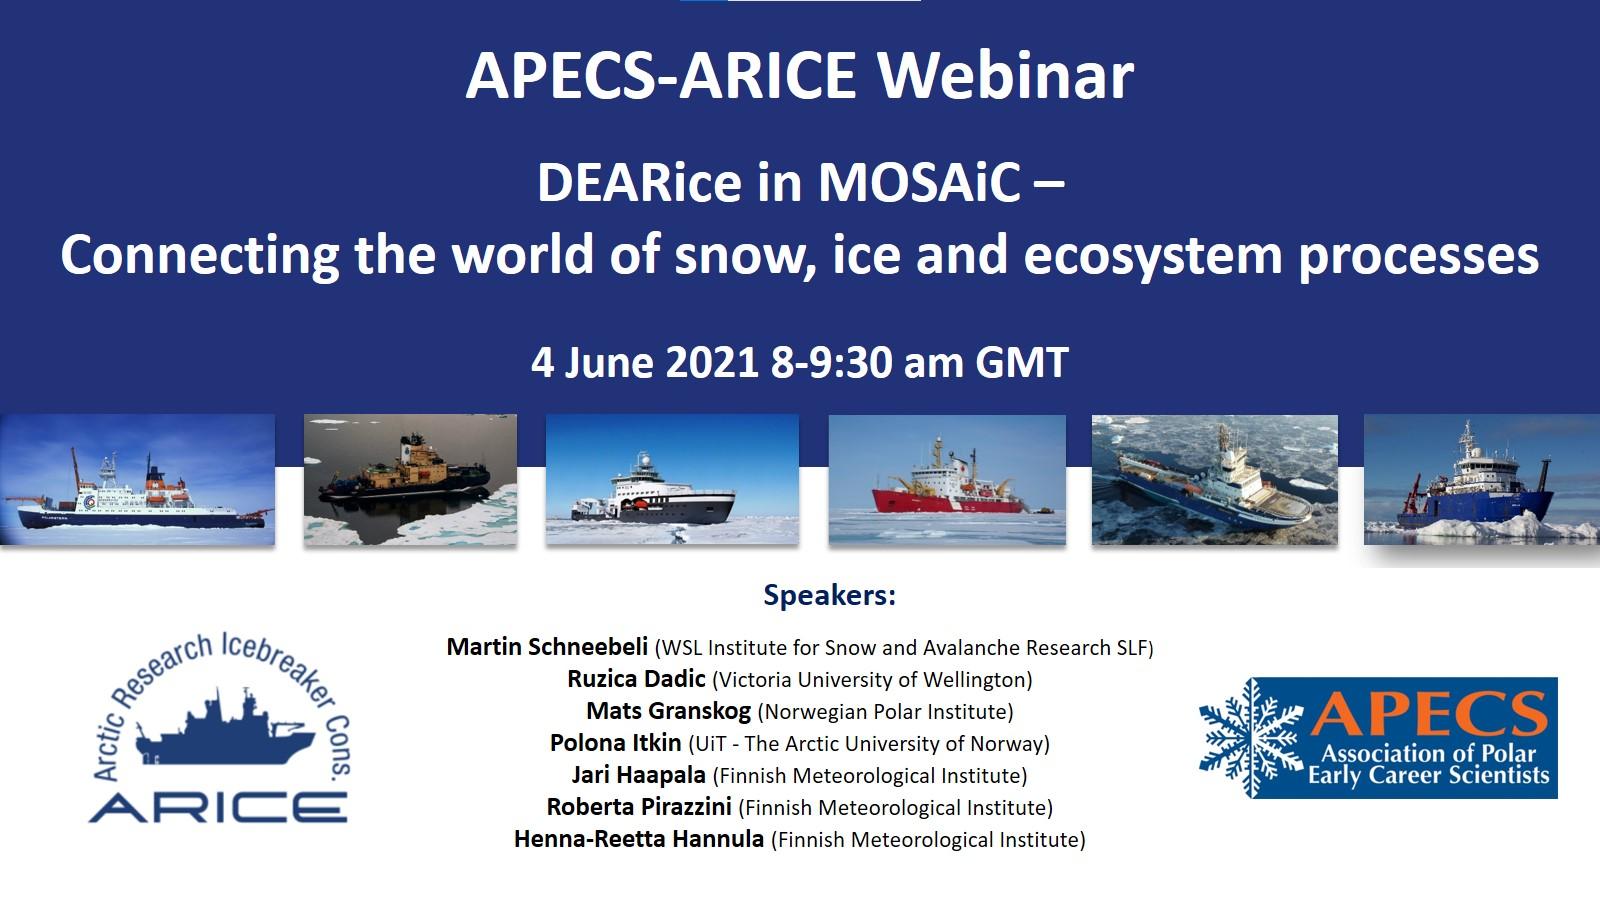 APECS-ARICE webinar: DEARice in MOSAiC